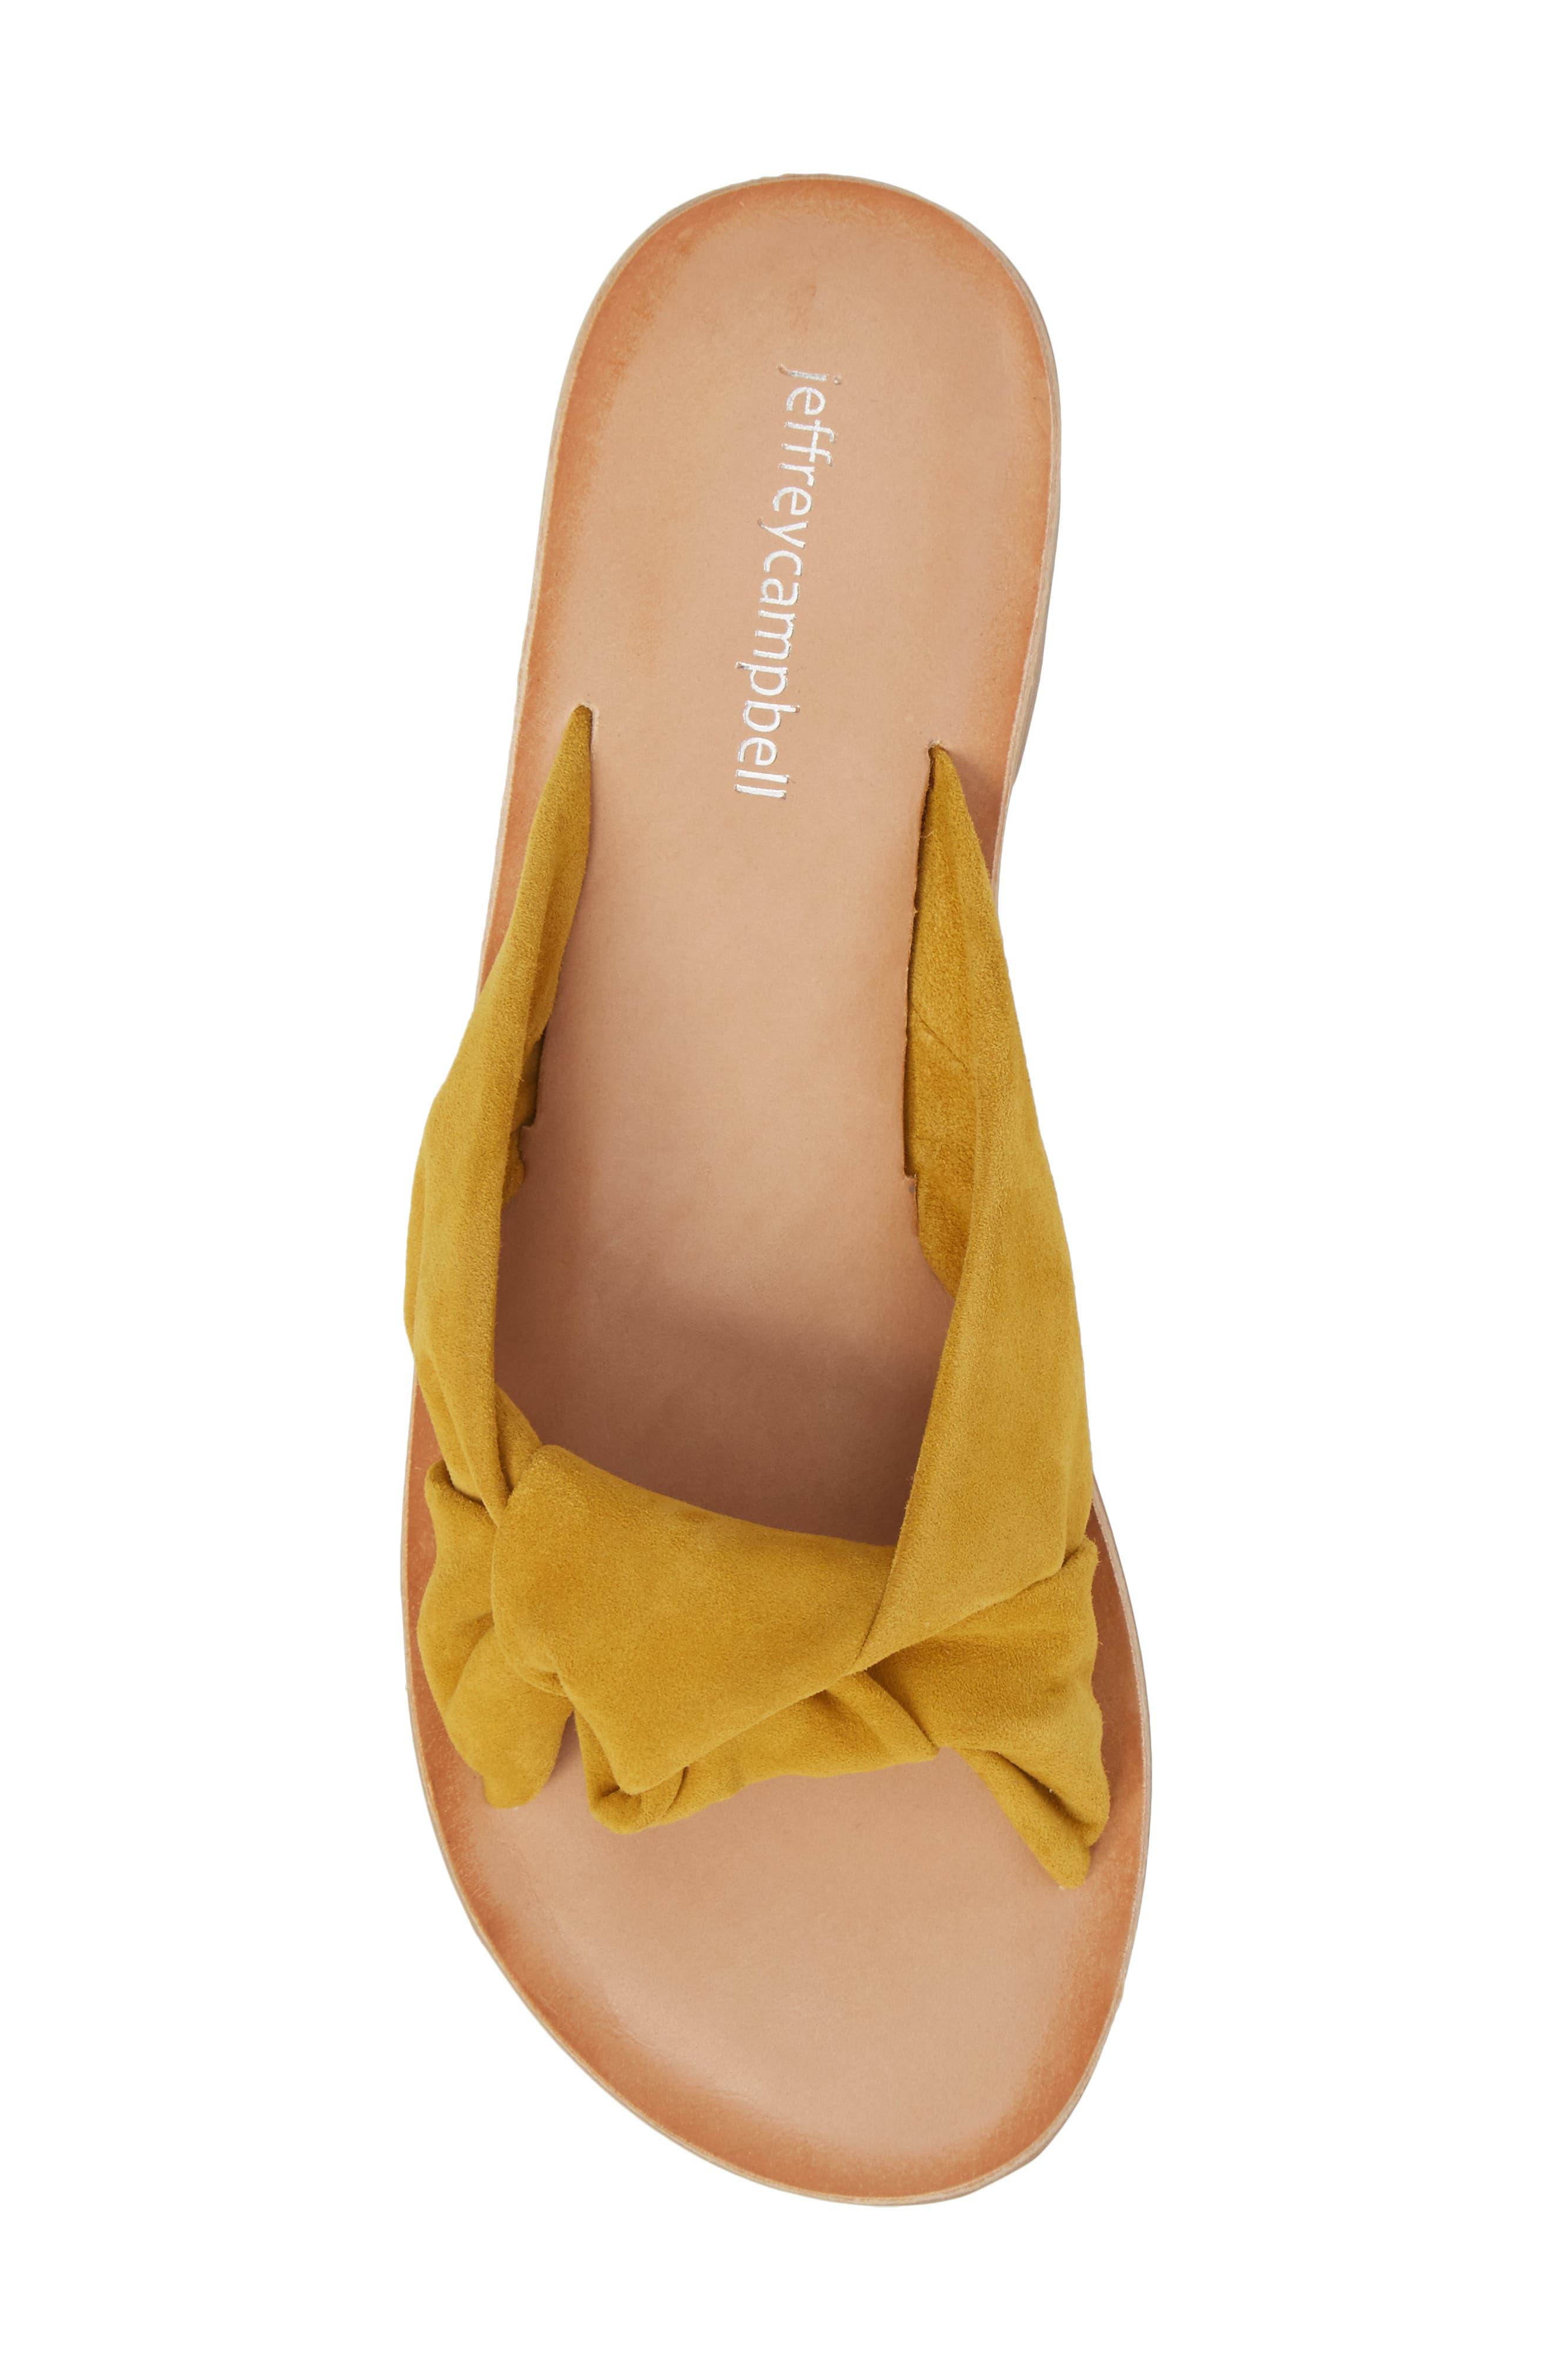 Zocalo Slide Sandal,                             Alternate thumbnail 5, color,                             Mustard Suede